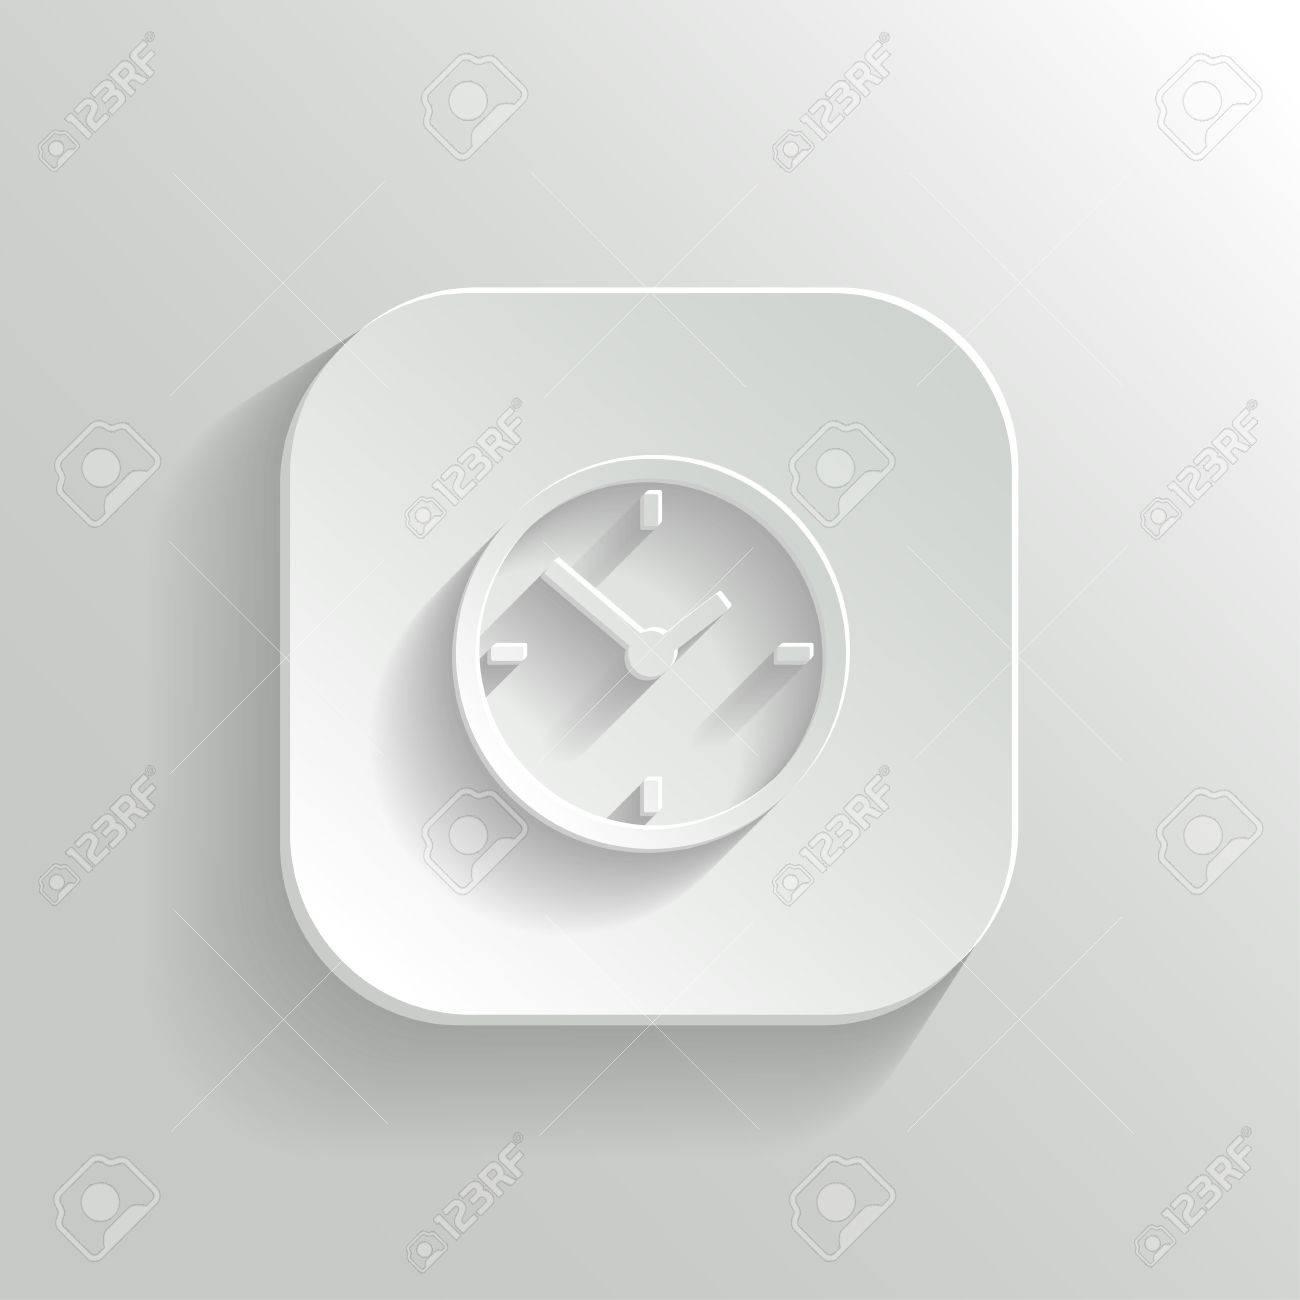 Clock icon - vector white app button with shadow Stock Vector - 22406029